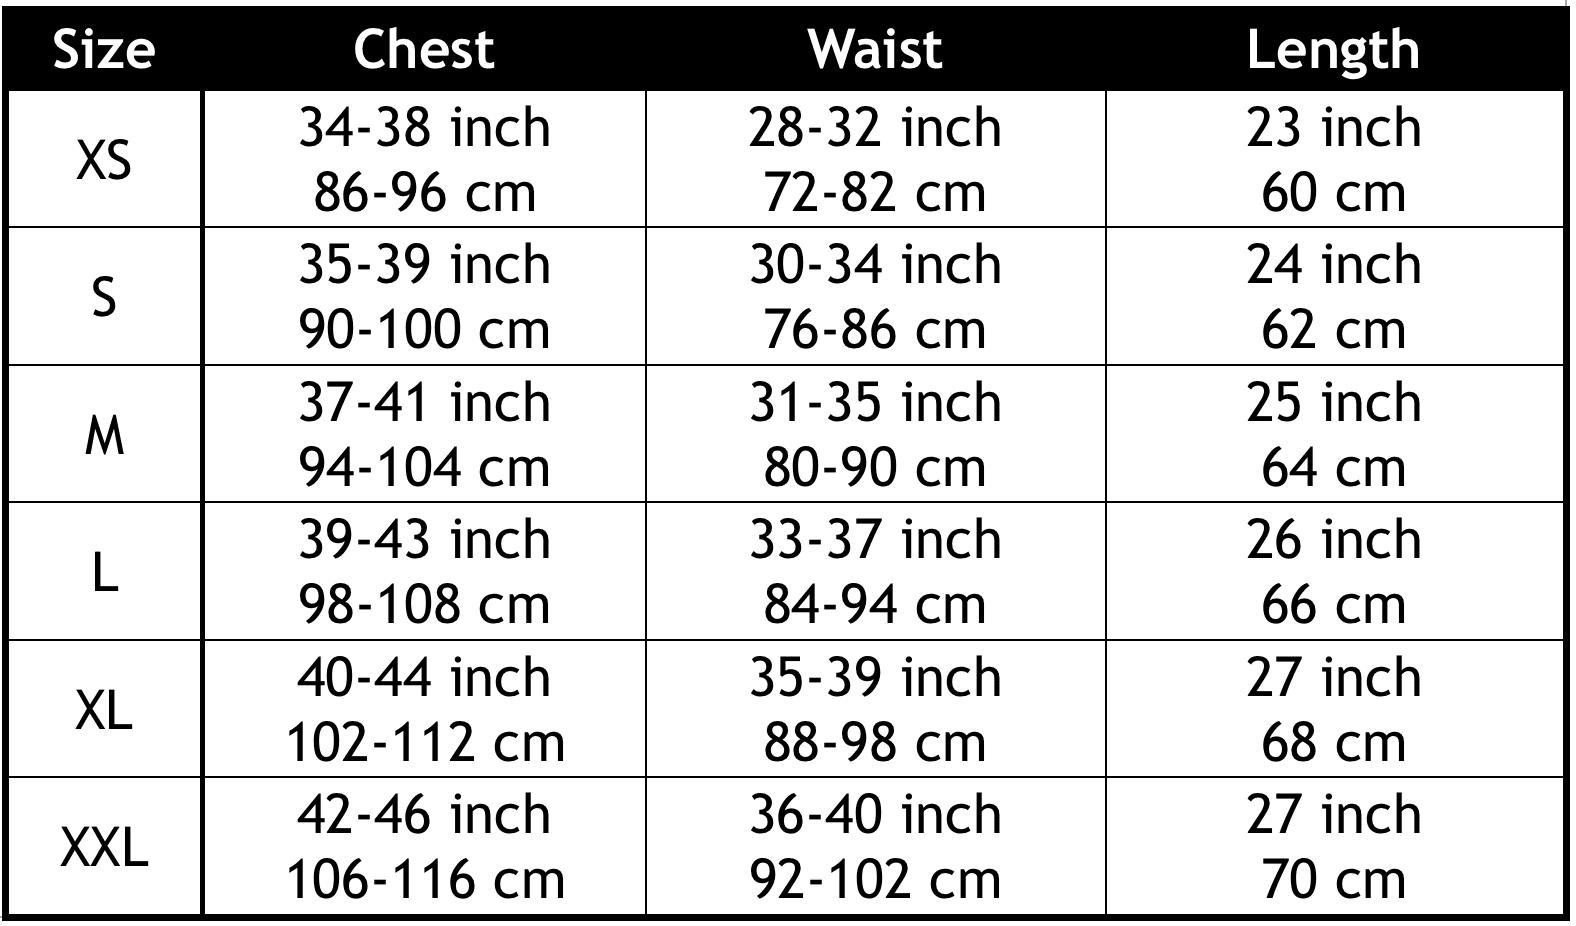 sauna shaper men size chart